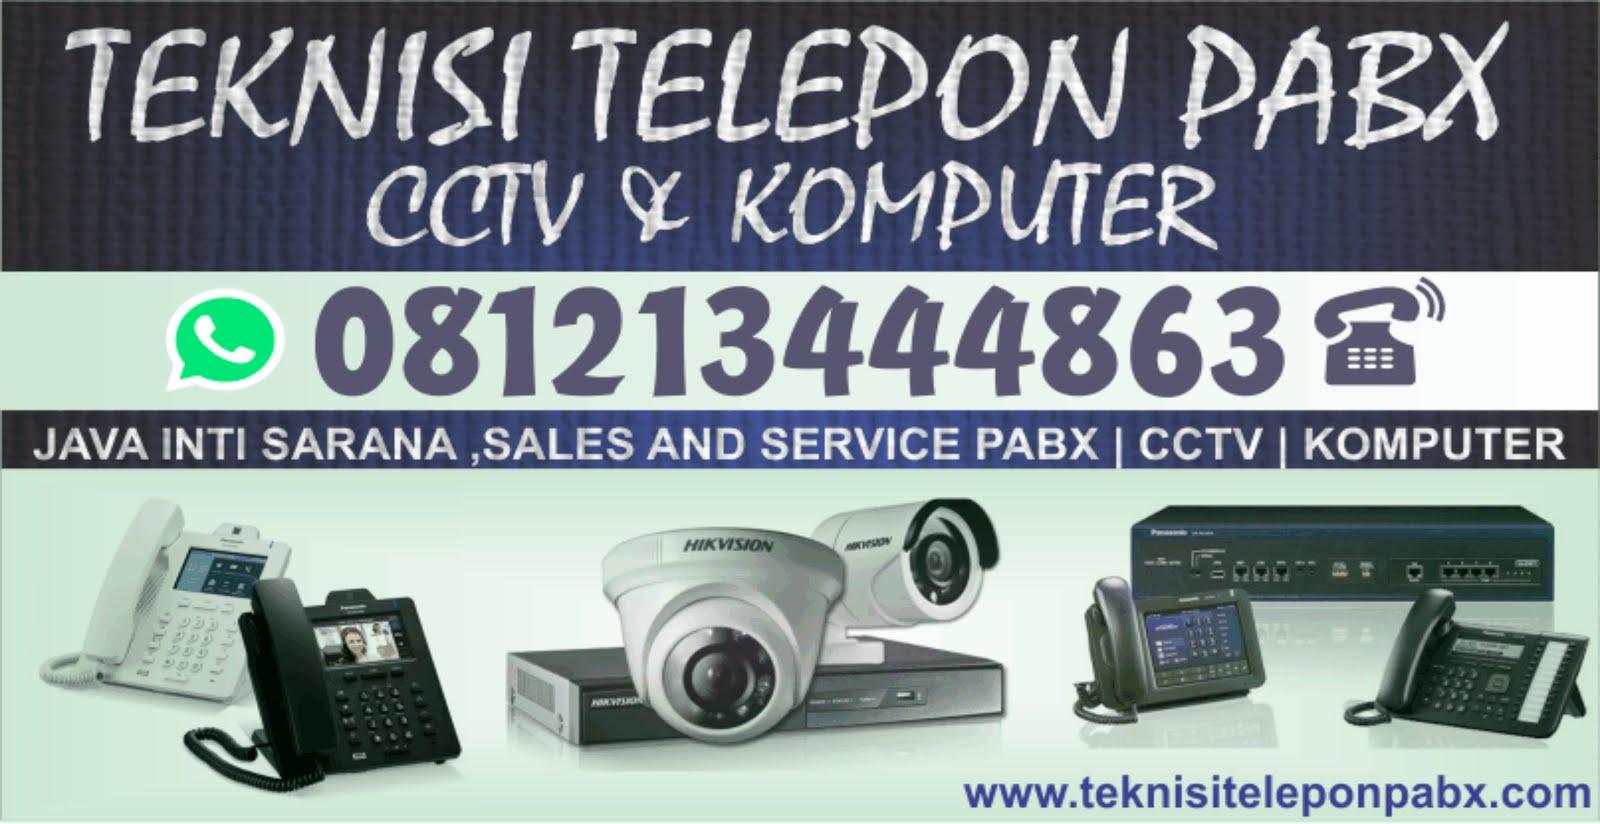 Teknisi Telepon PABX